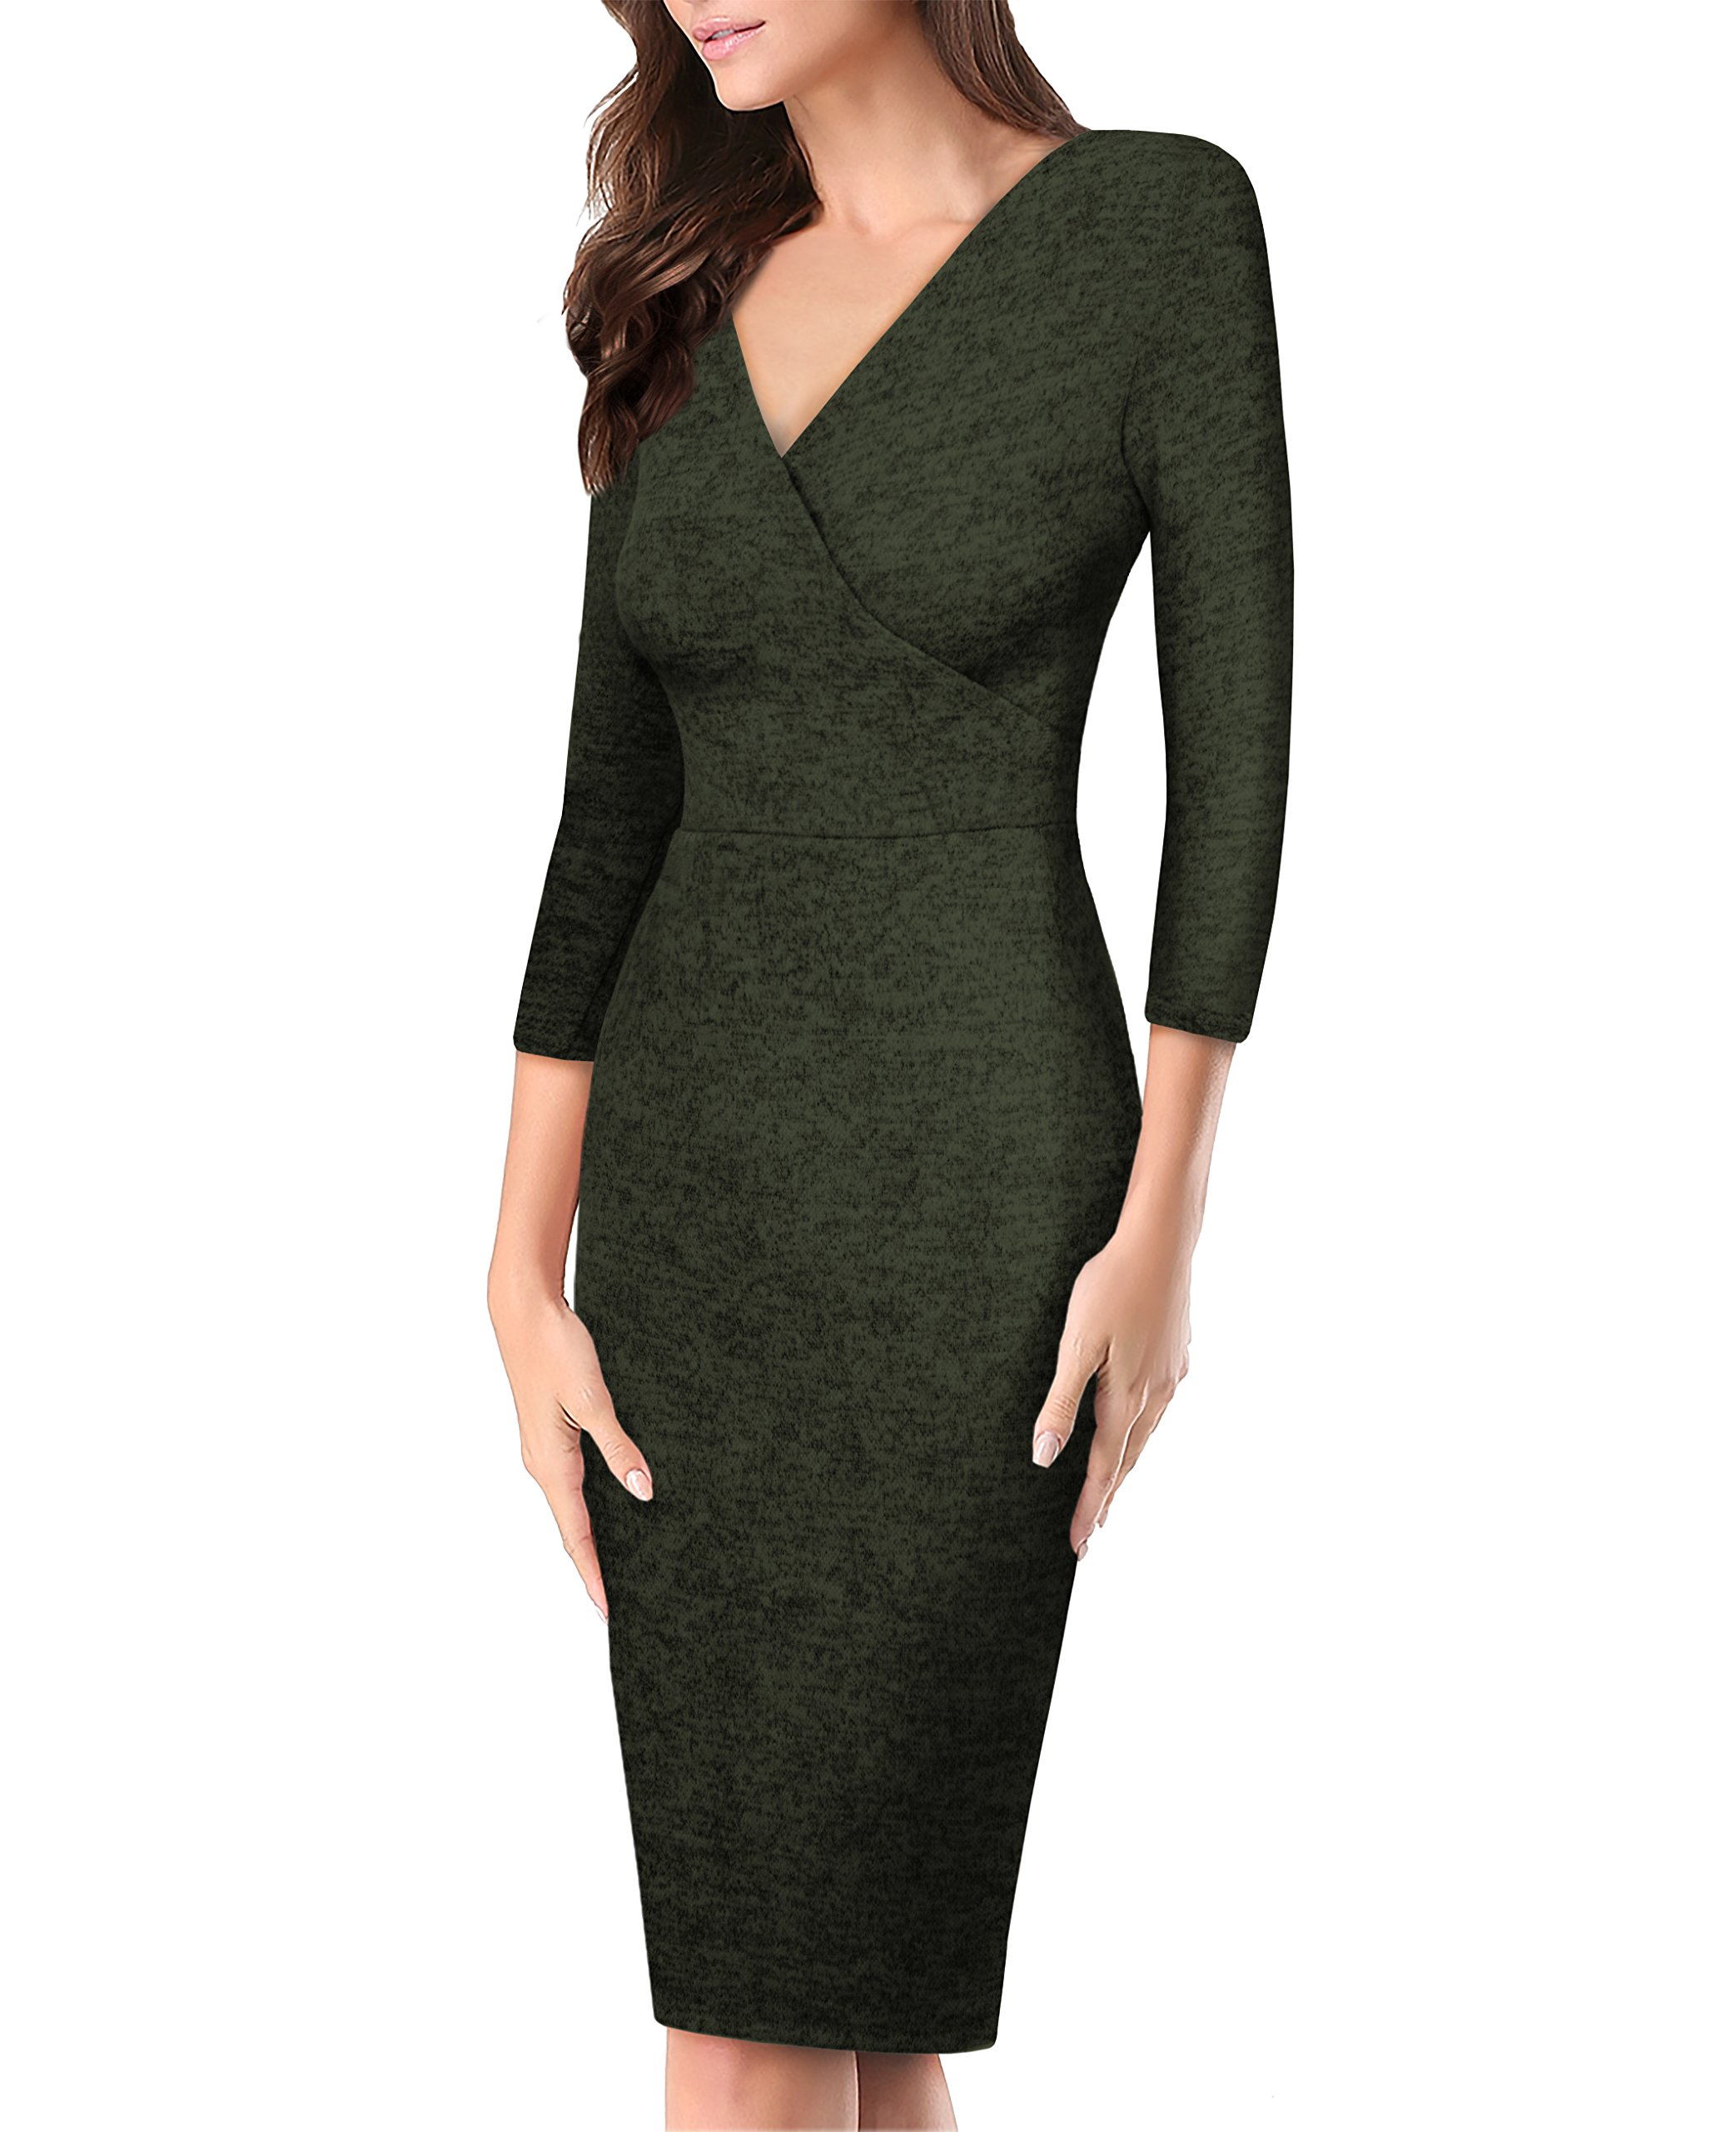 HyBrid & Company Women's Plum Cross V Neck Midi Dress KDR44322 G4000 Olive Large